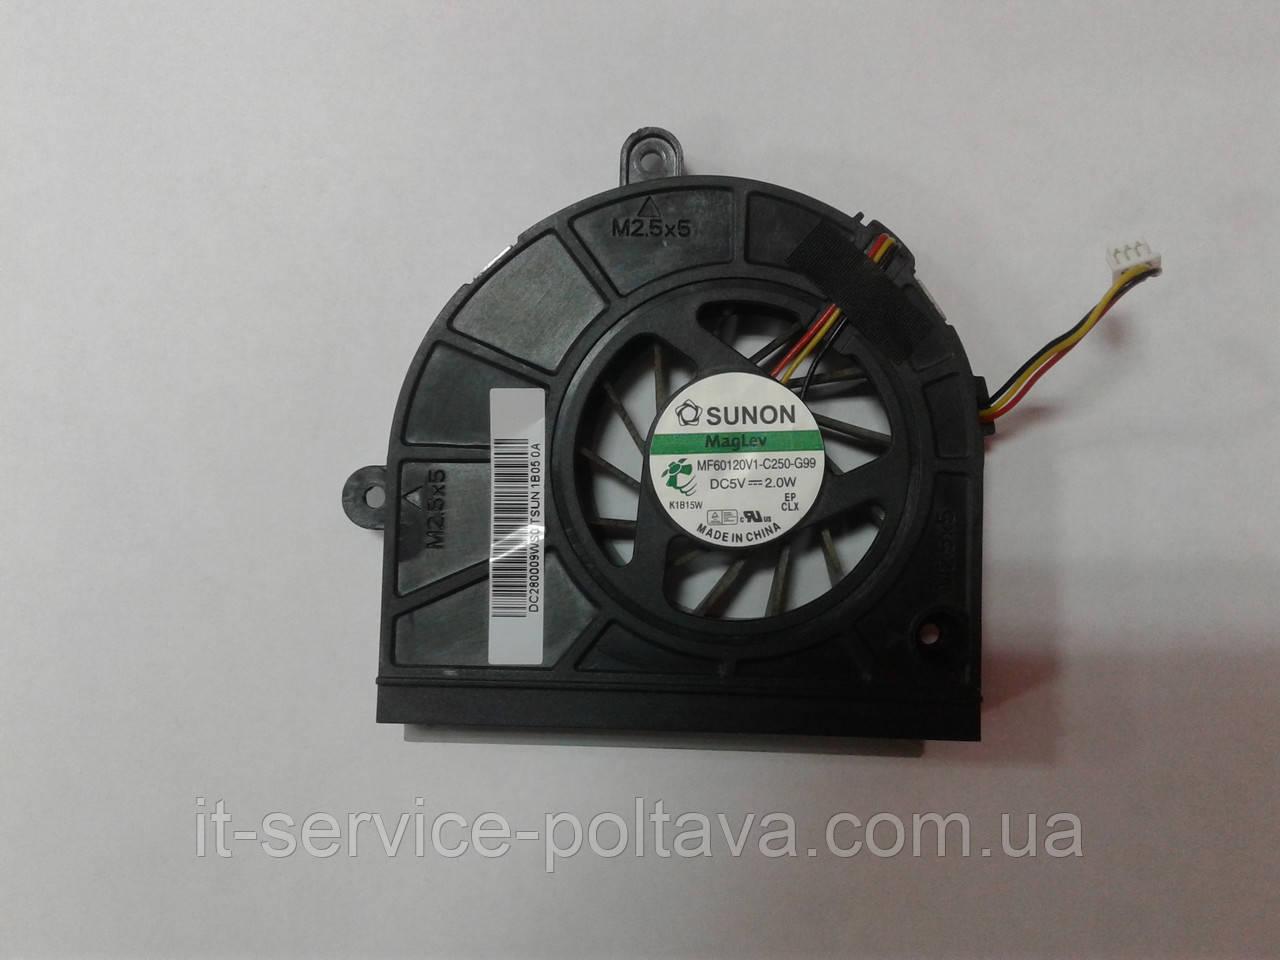 Кулер SUNON MF60120V1-C250-G99 для ноутбука Asus K43, K53, K73